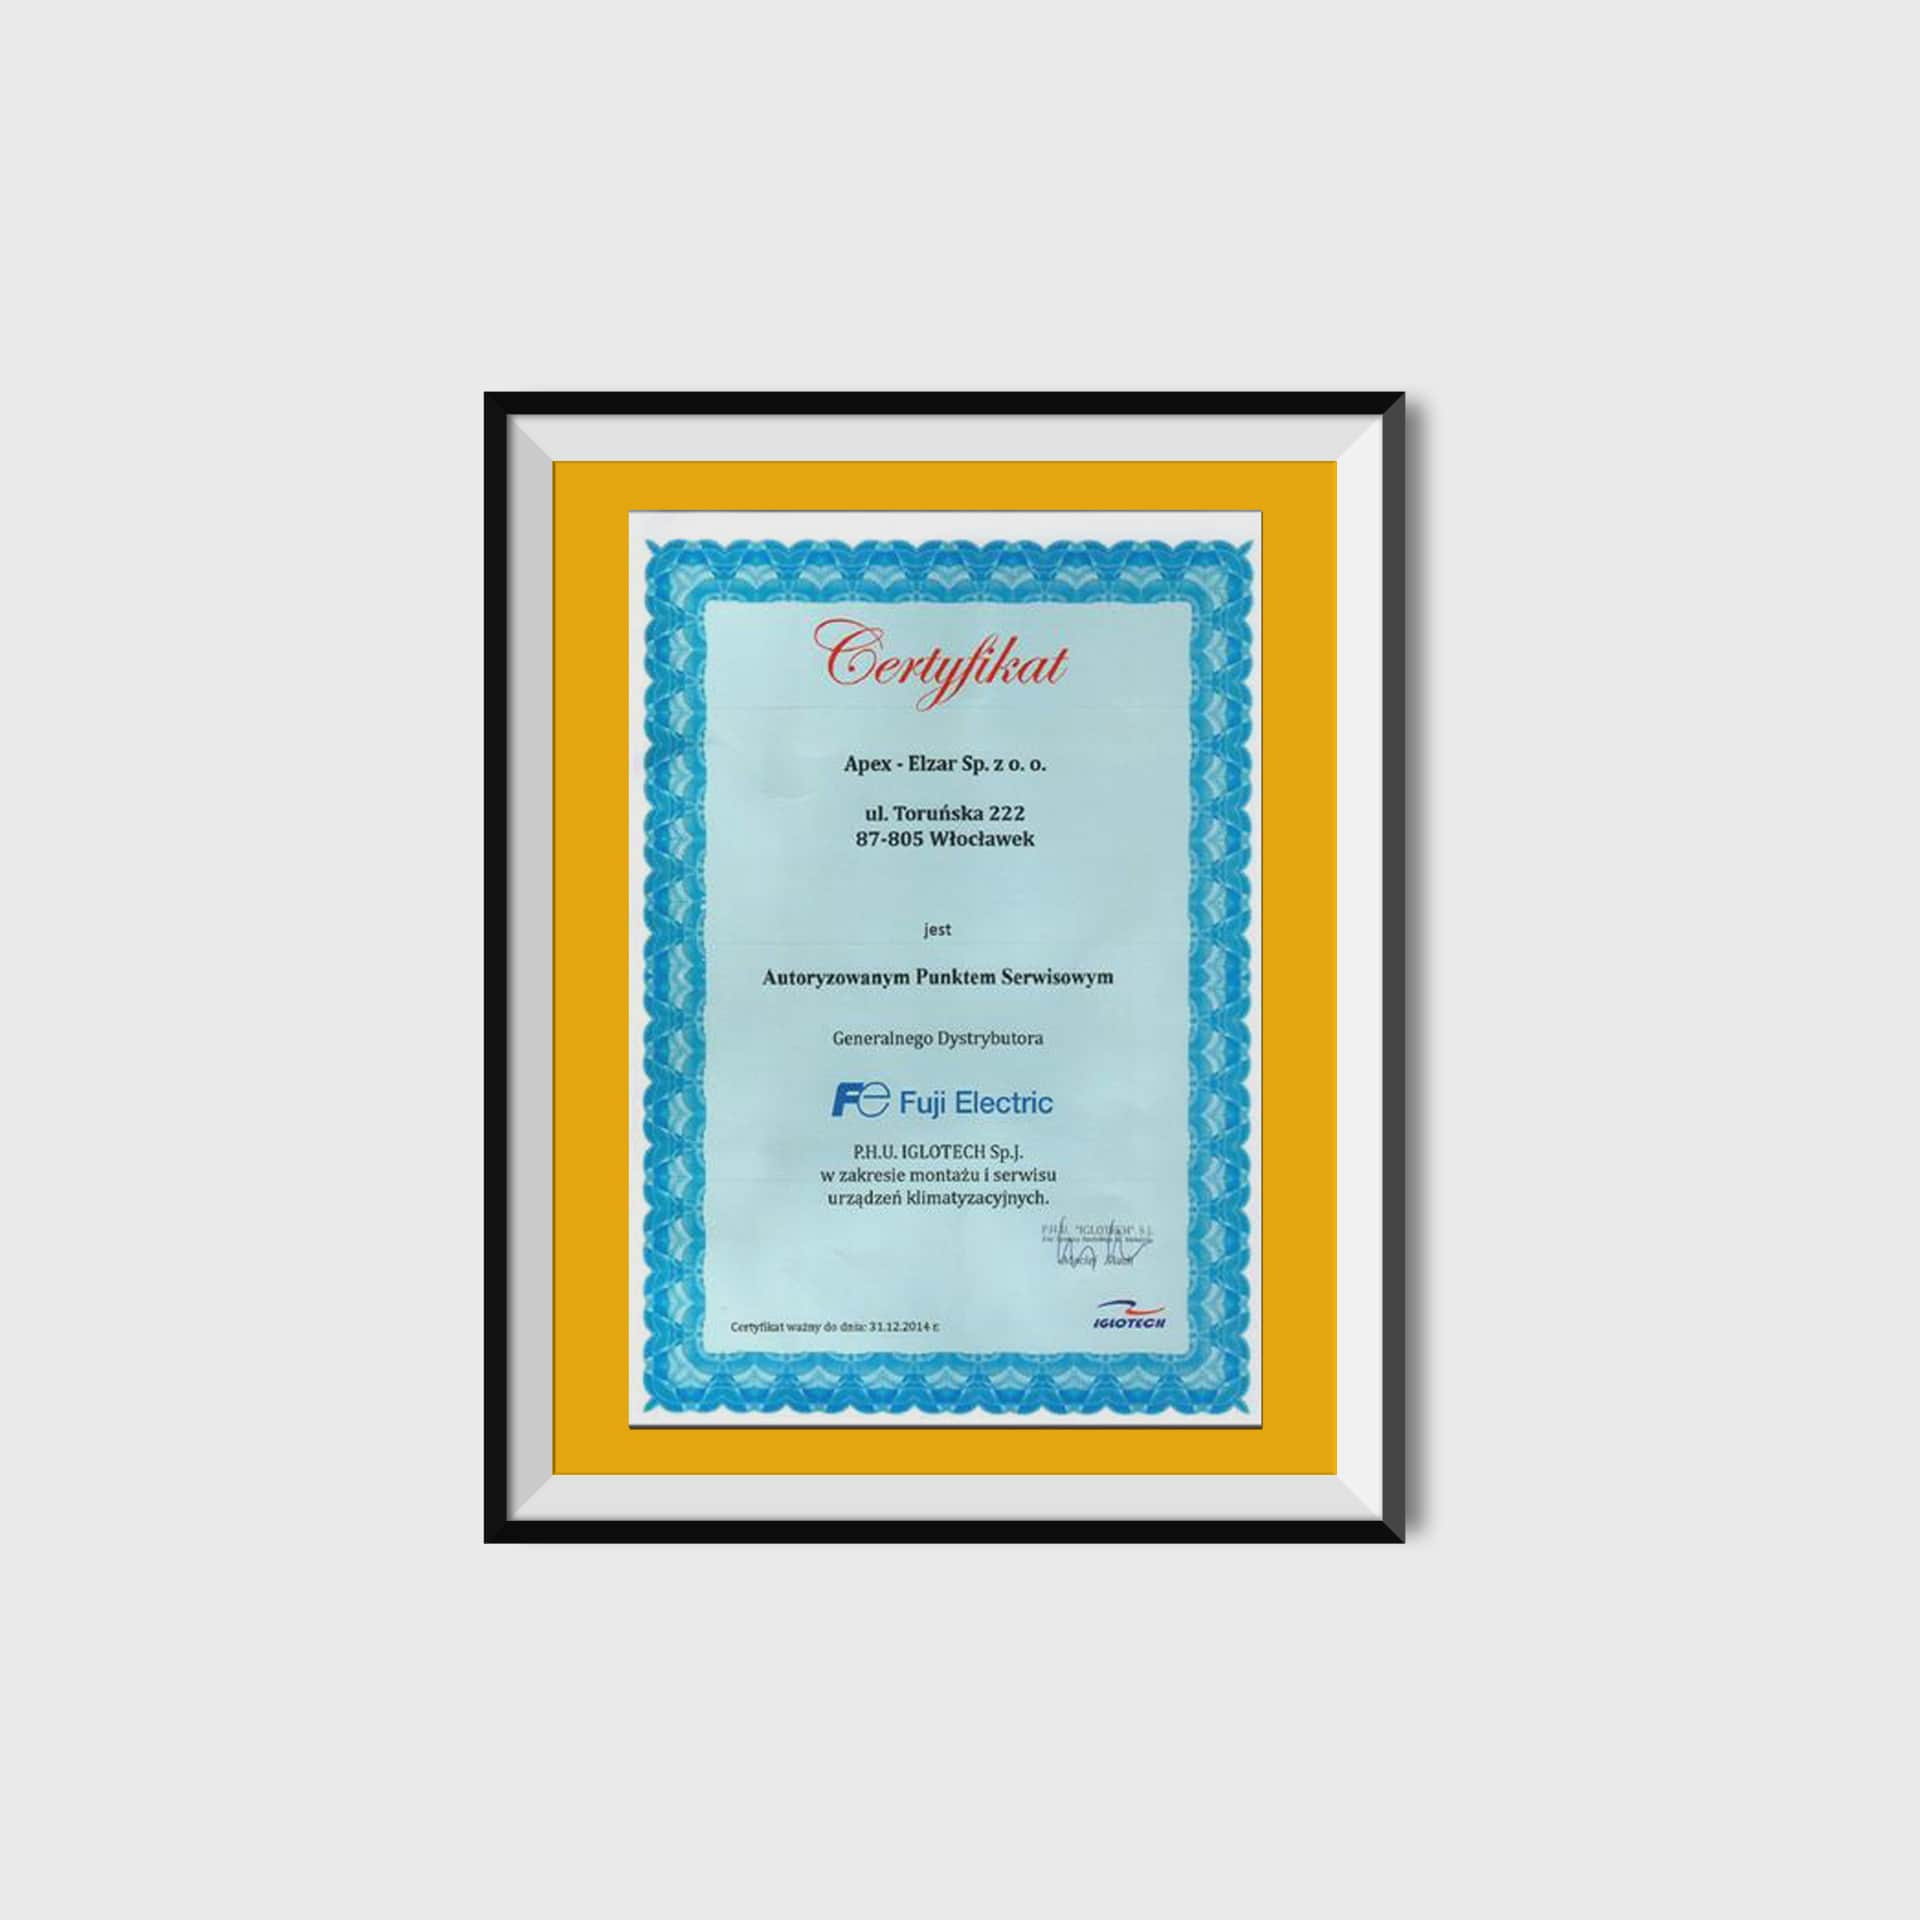 Certyfikat od firmy Iglotech<br/>31.12.214